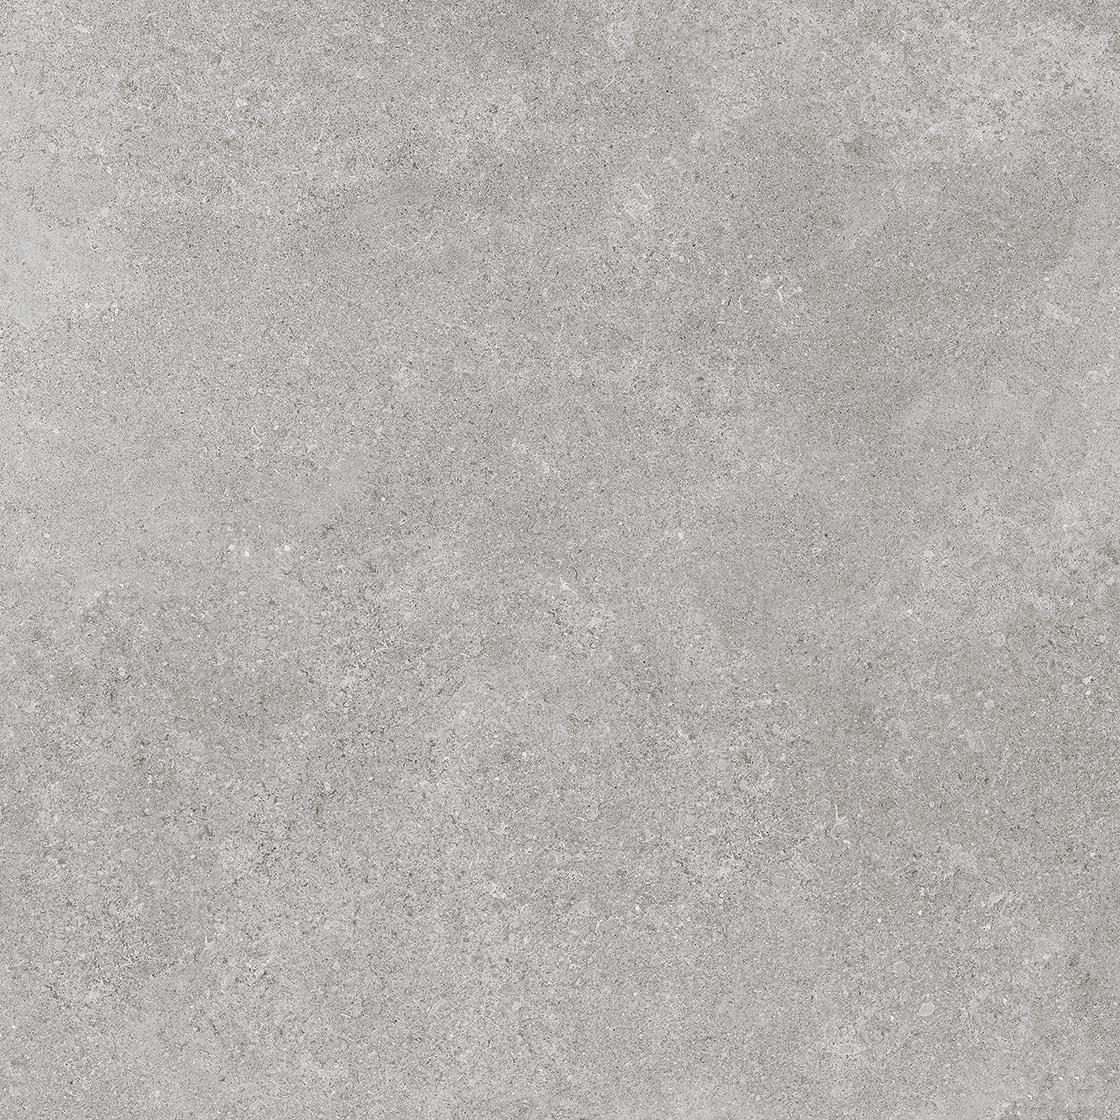 Orion Stone 74,7x74,7